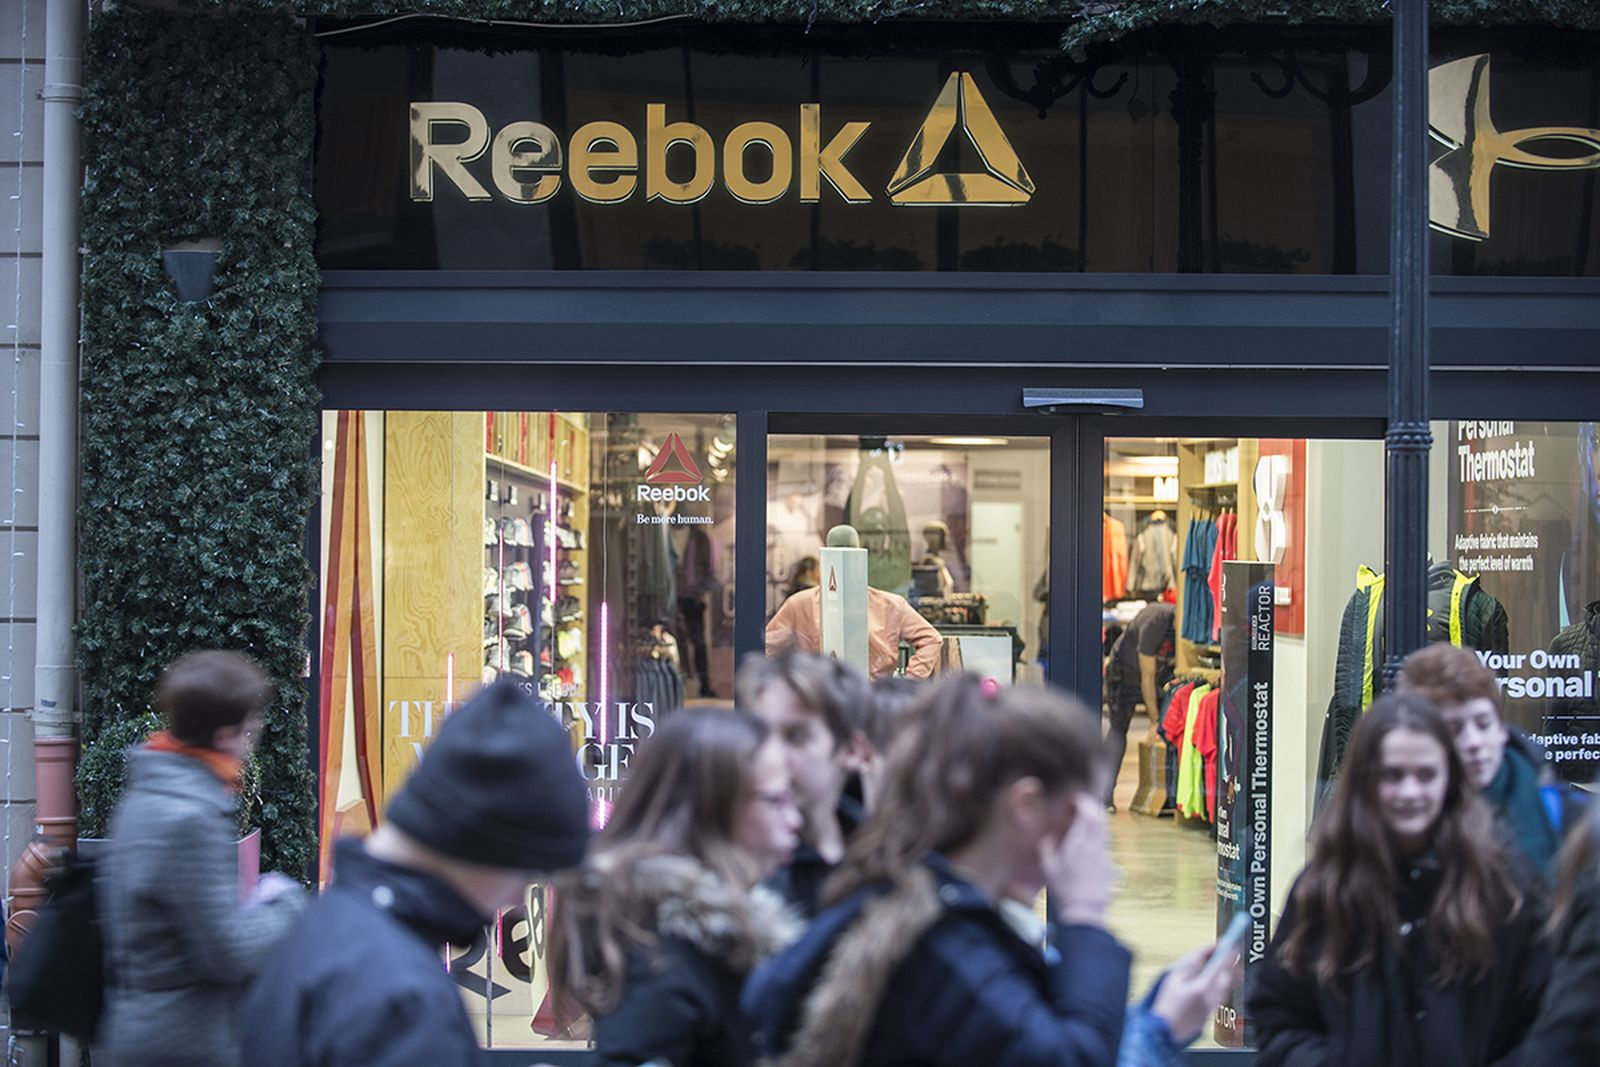 Reebok store sign